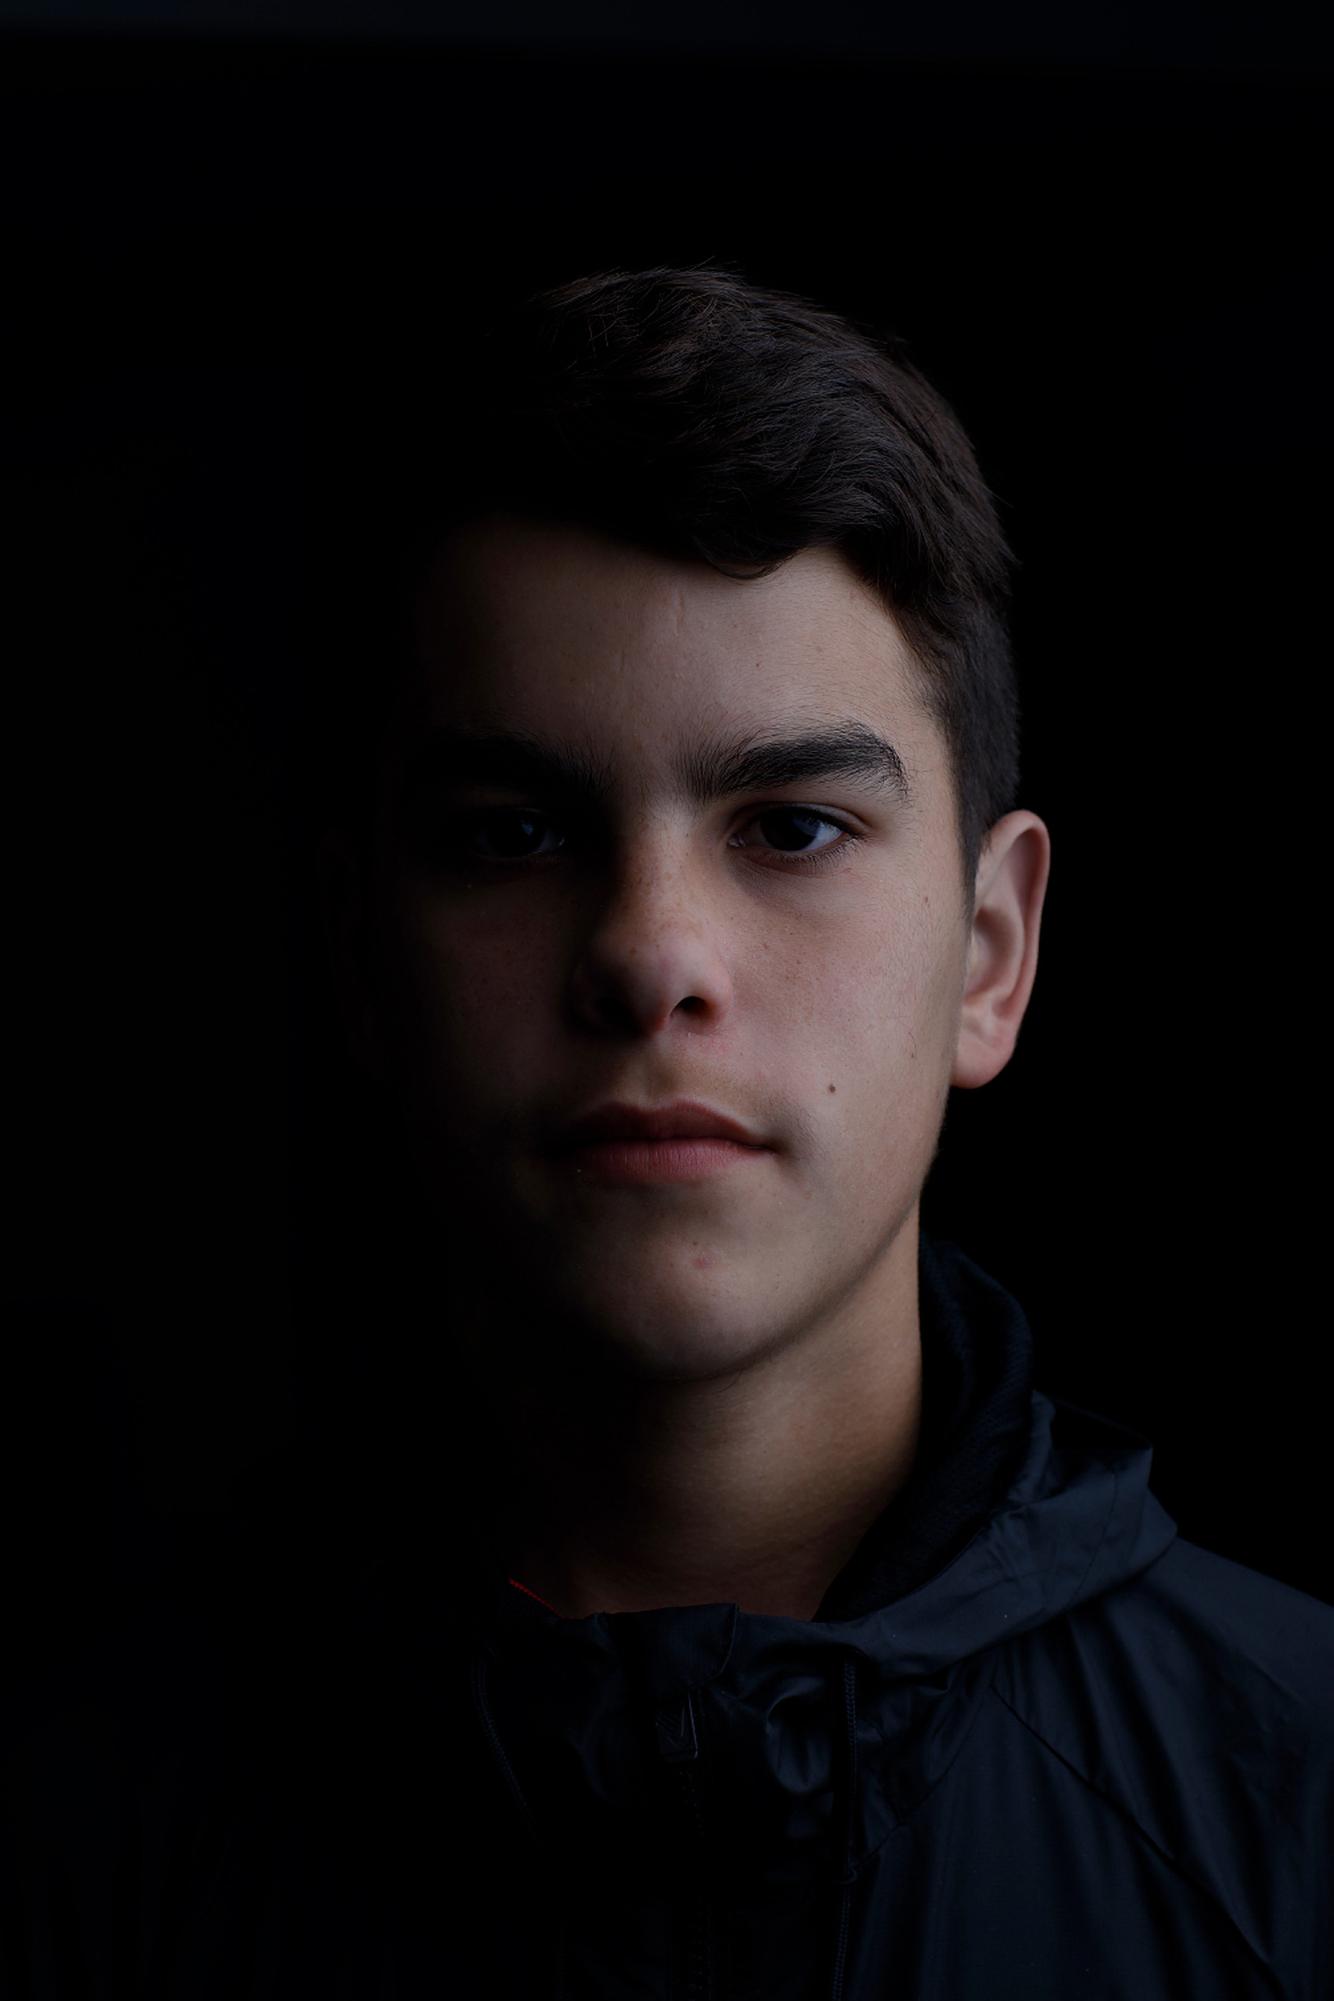 Portraits_028.jpg